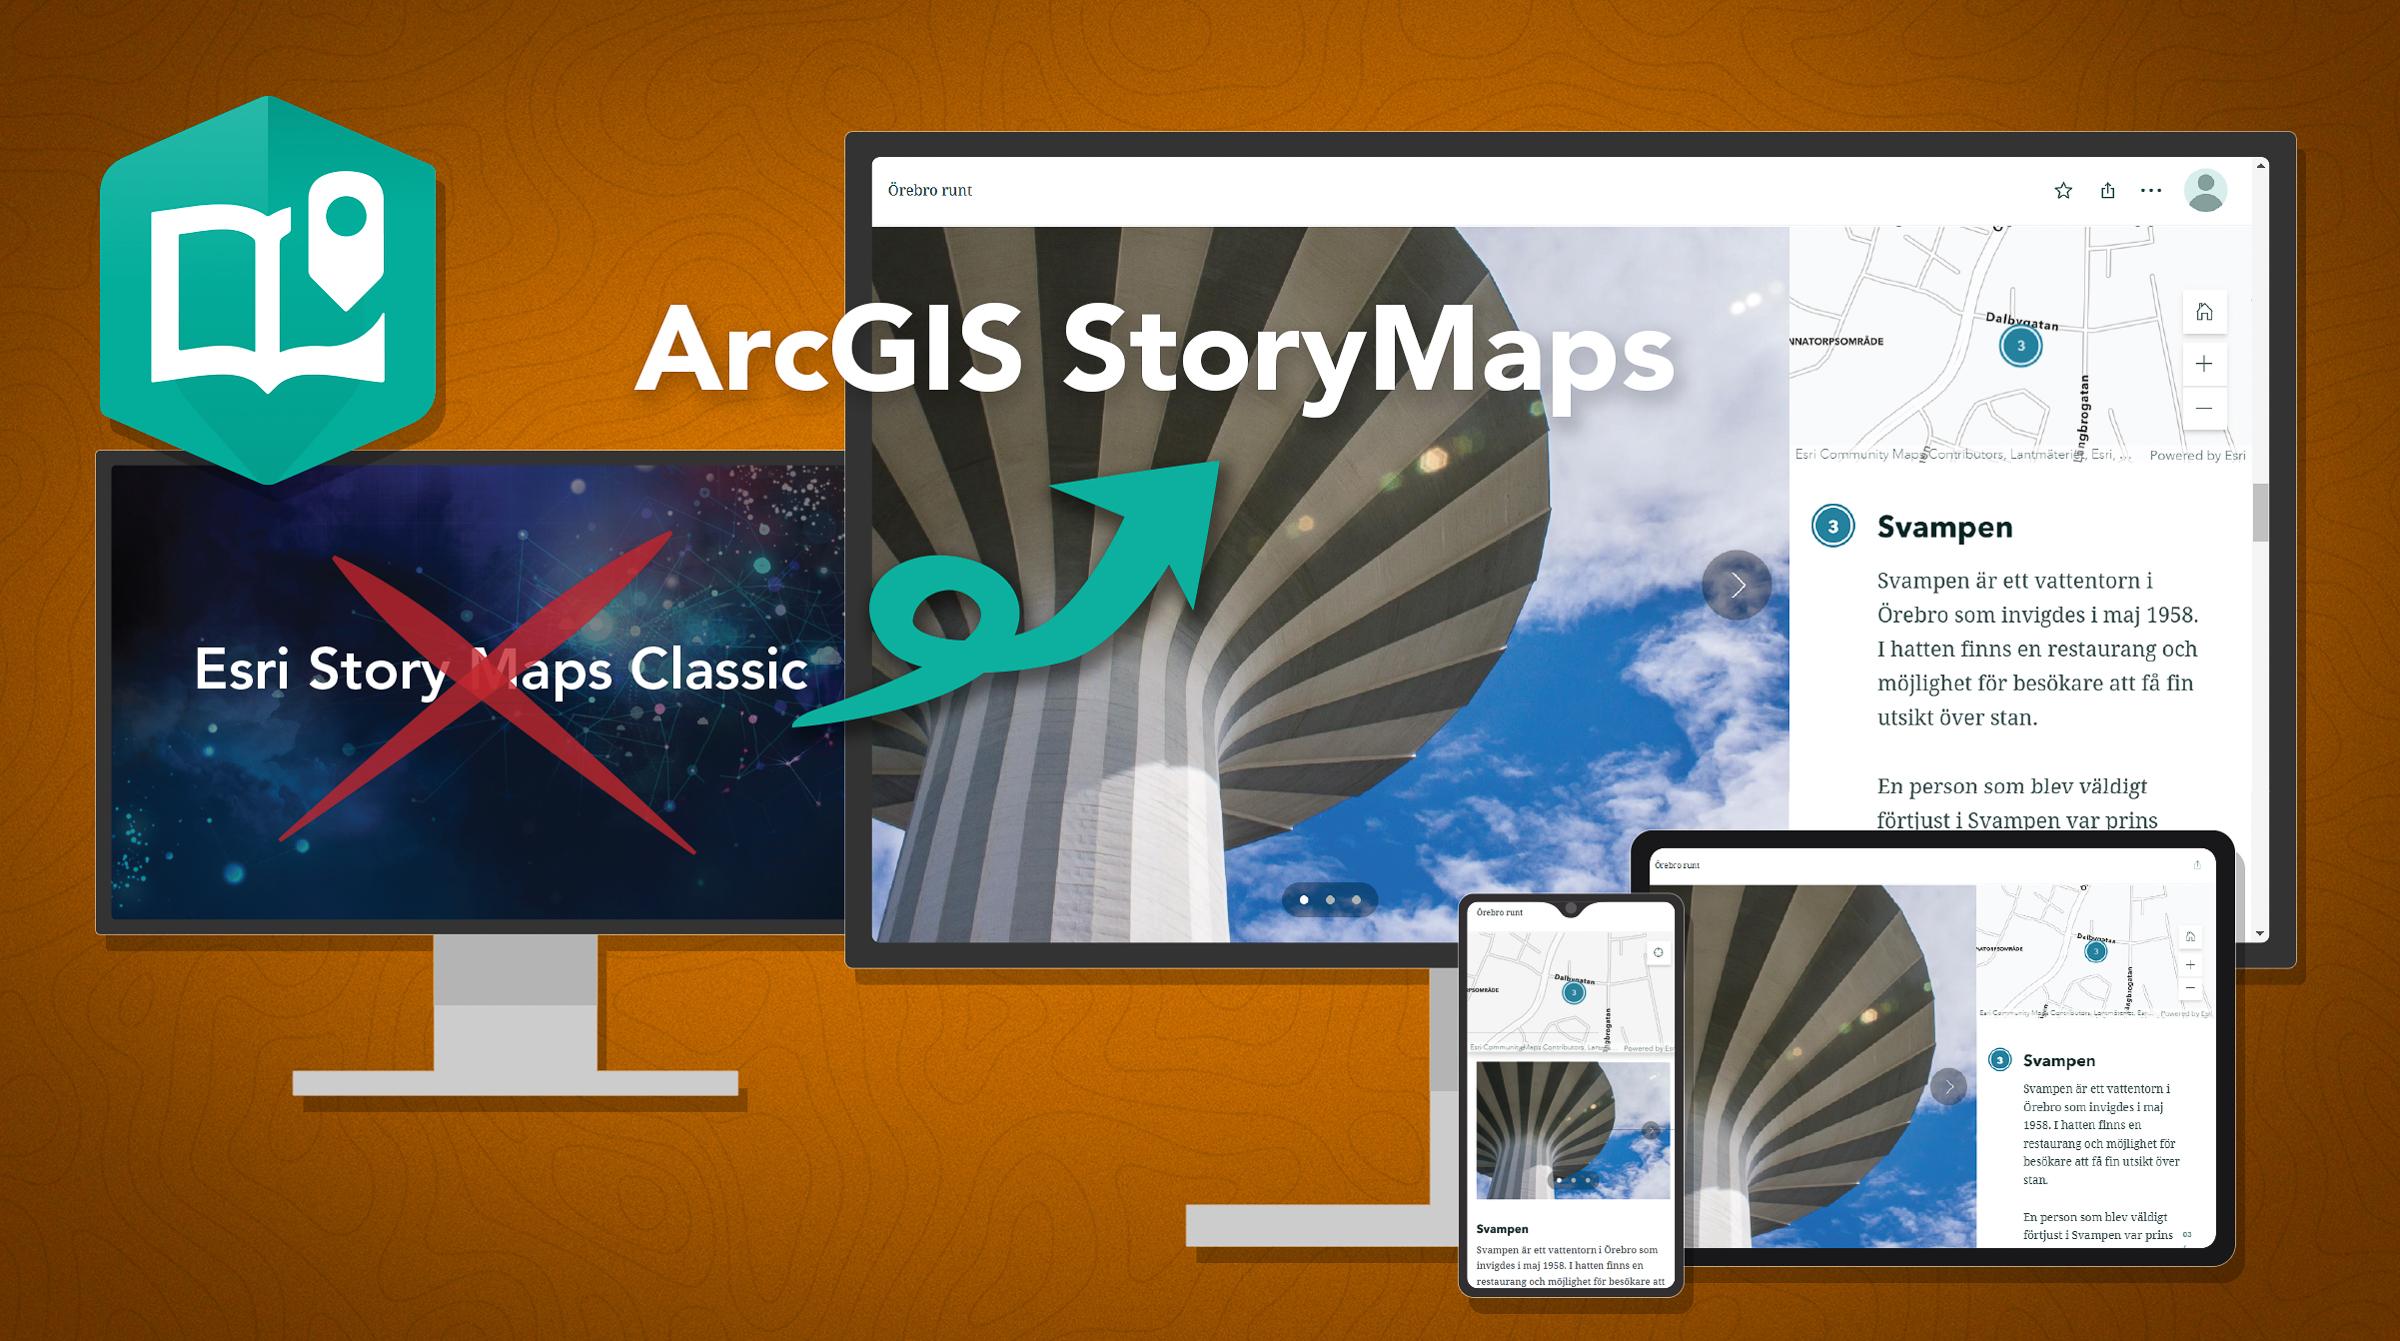 Esri Story Maps Classic fasas ut